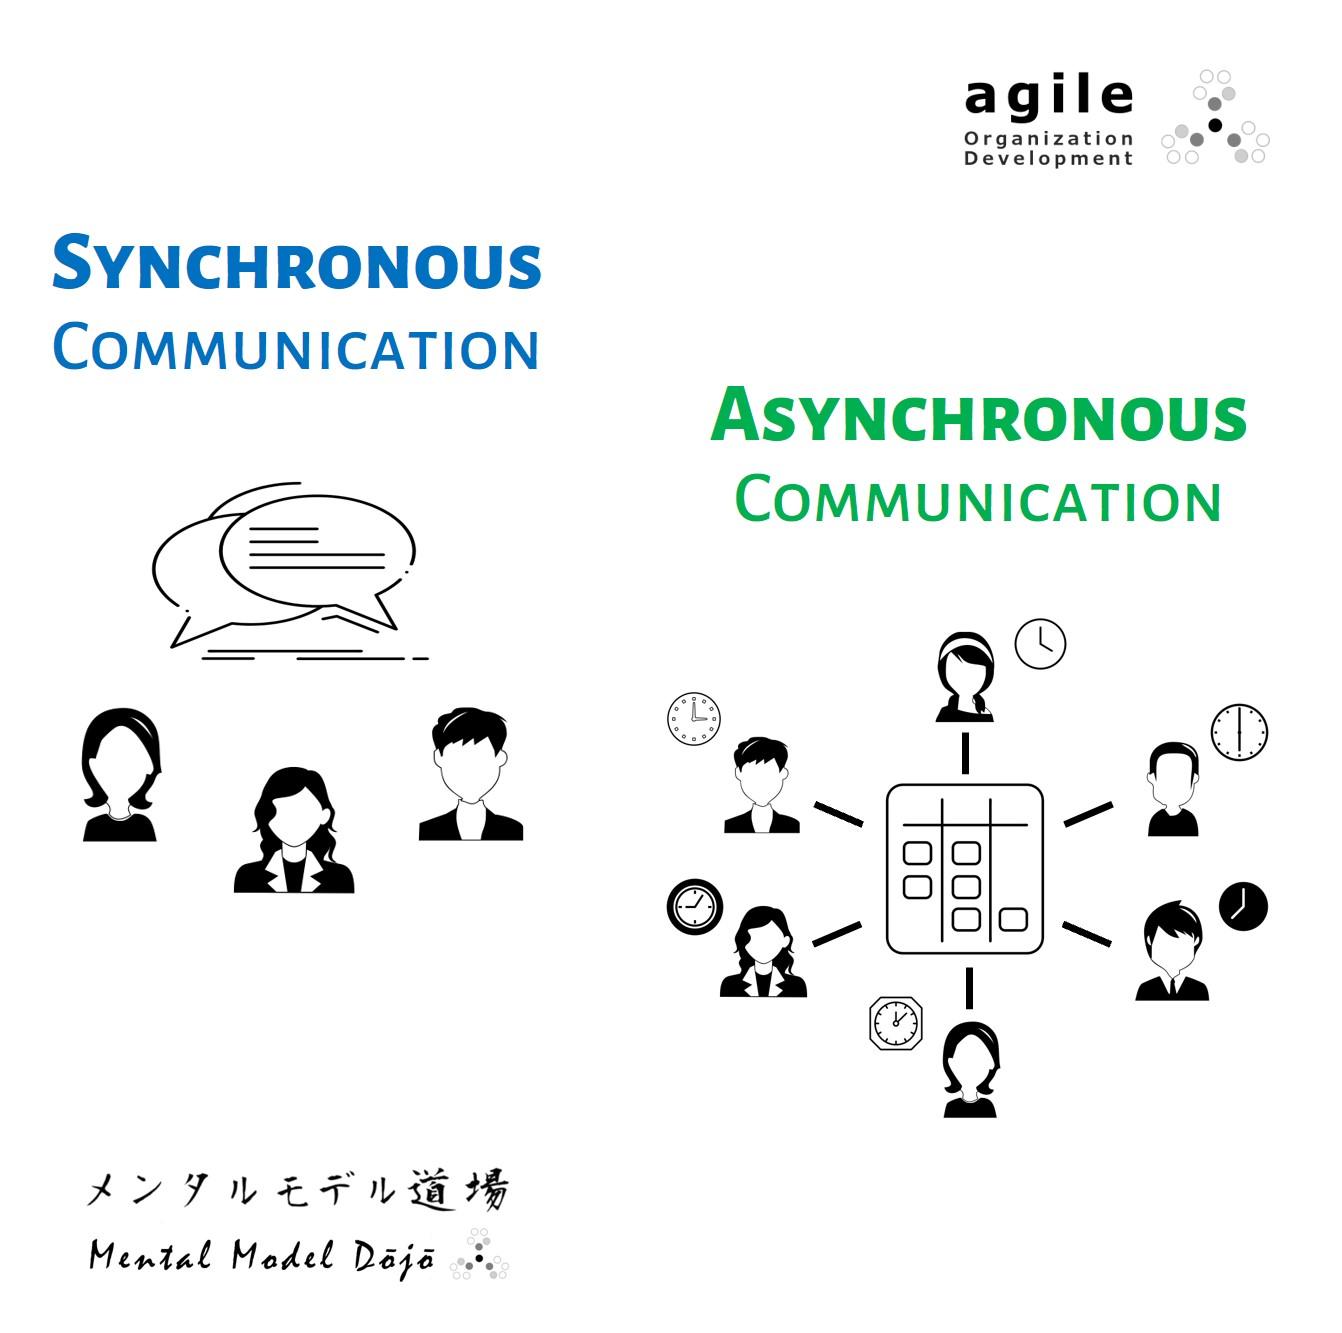 Synchronous Asynchronous Communication